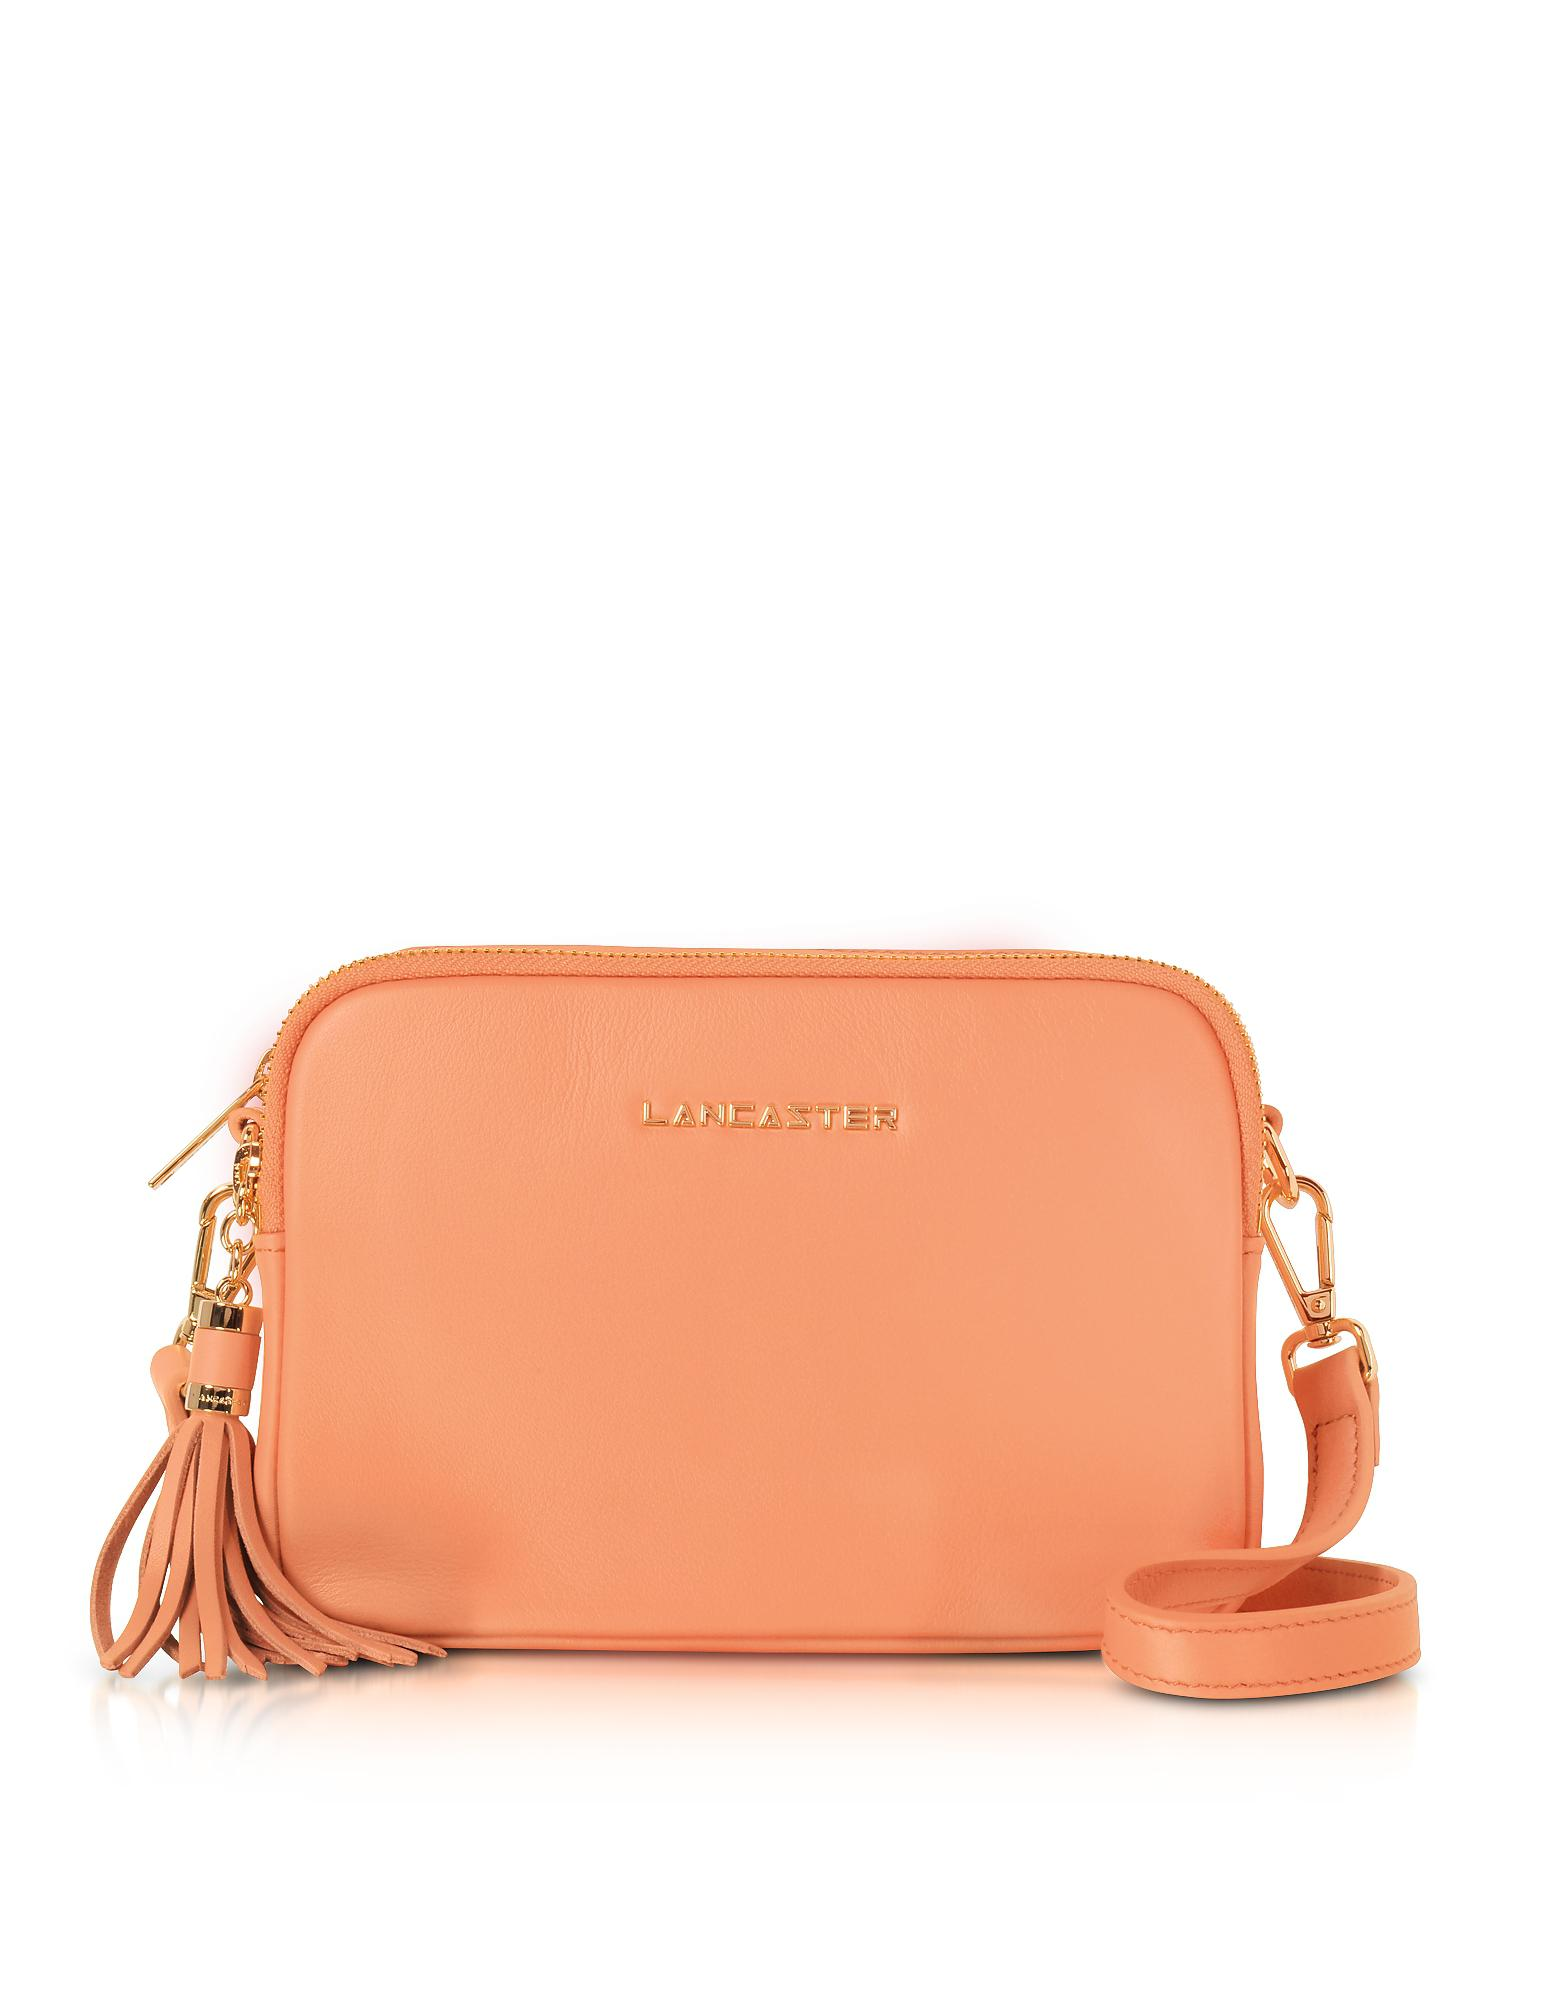 0fcc2f1b6929 Lancaster Paris Mademoiselle Ana Leather Crossbody Bag in Orange - Lyst